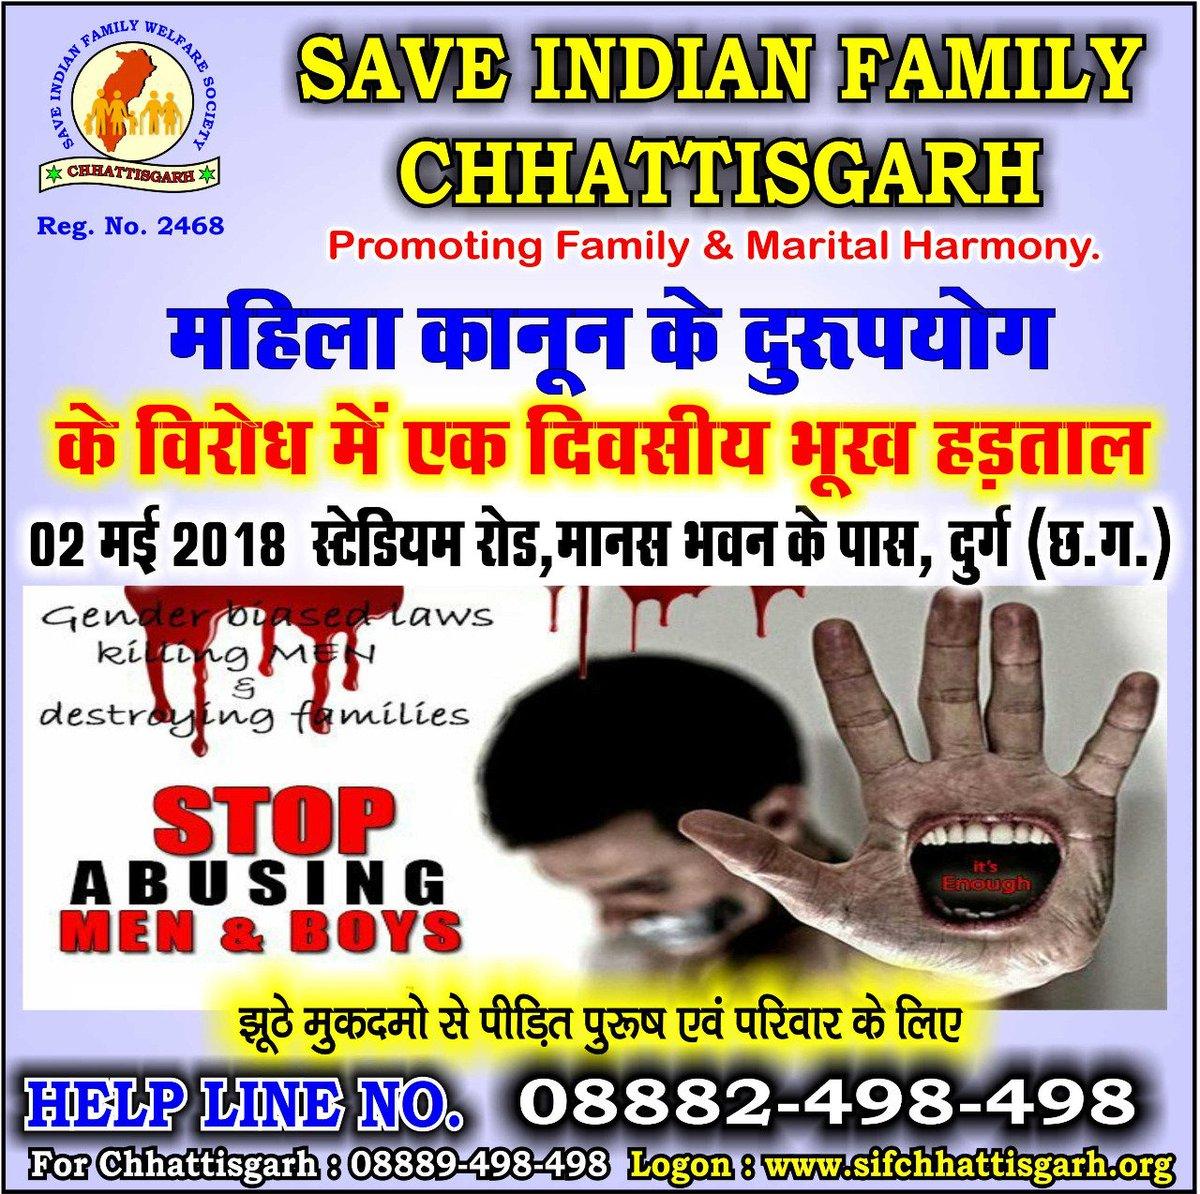 Argho On Twitter Sif Chhattisgarh Held One Day Symbolic Hunger